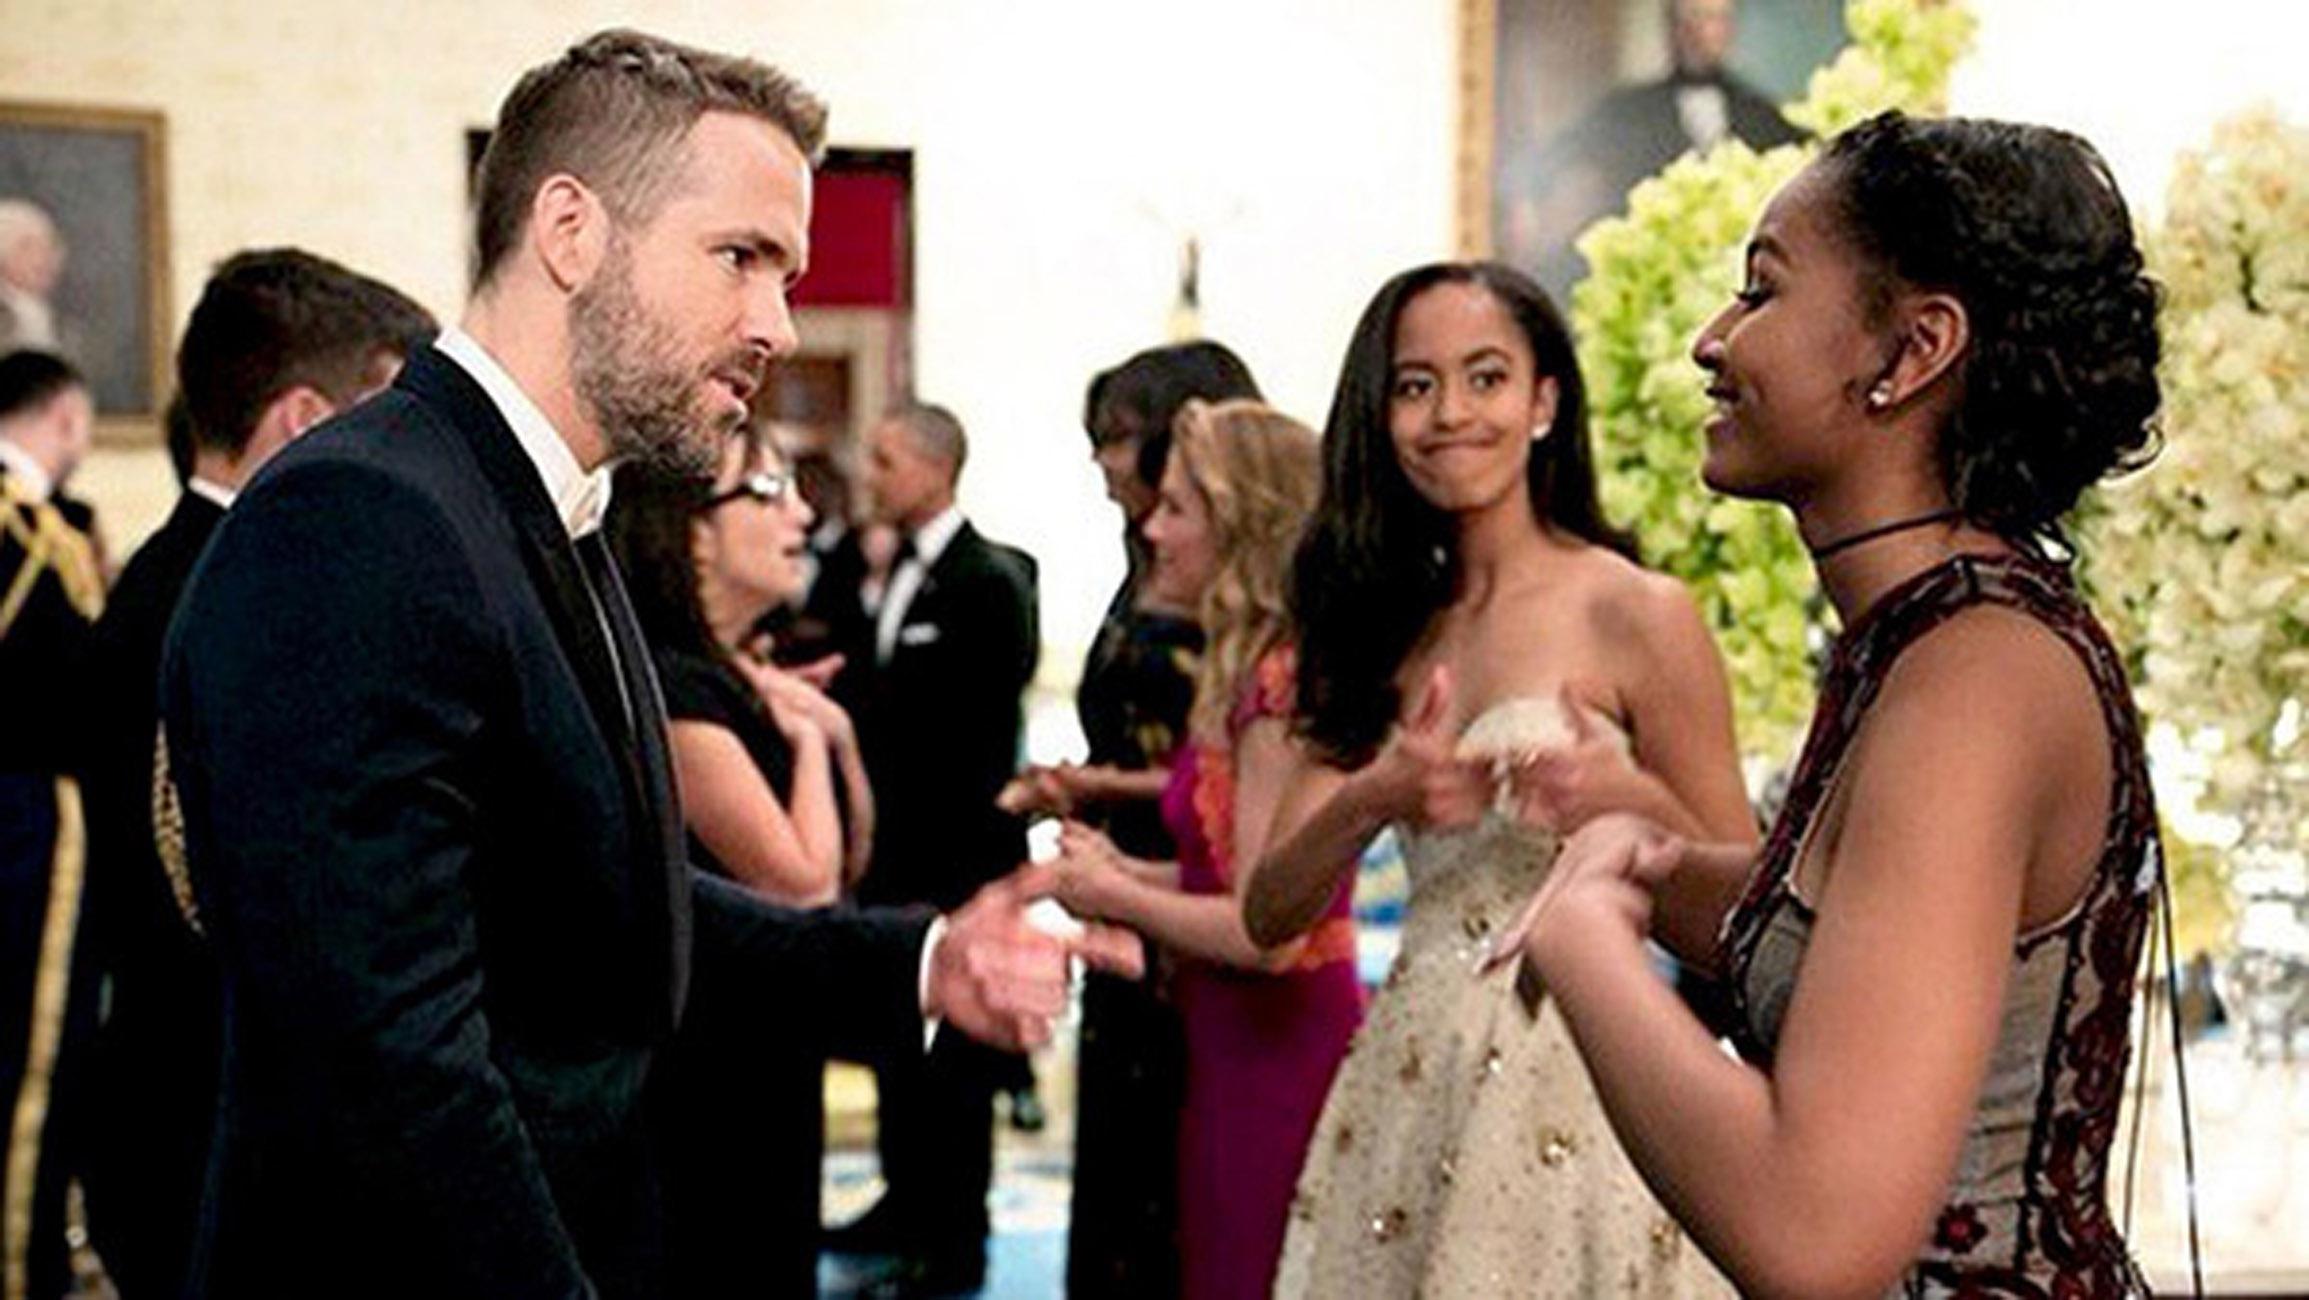 Sasha & Malia Obama Malia Obama Gives Thumbs Up To Sasha As She Fangirls Over Ryan Reynolds. (Credit: Pete Souza / White House) 75596 EDITORIAL USE ONLY